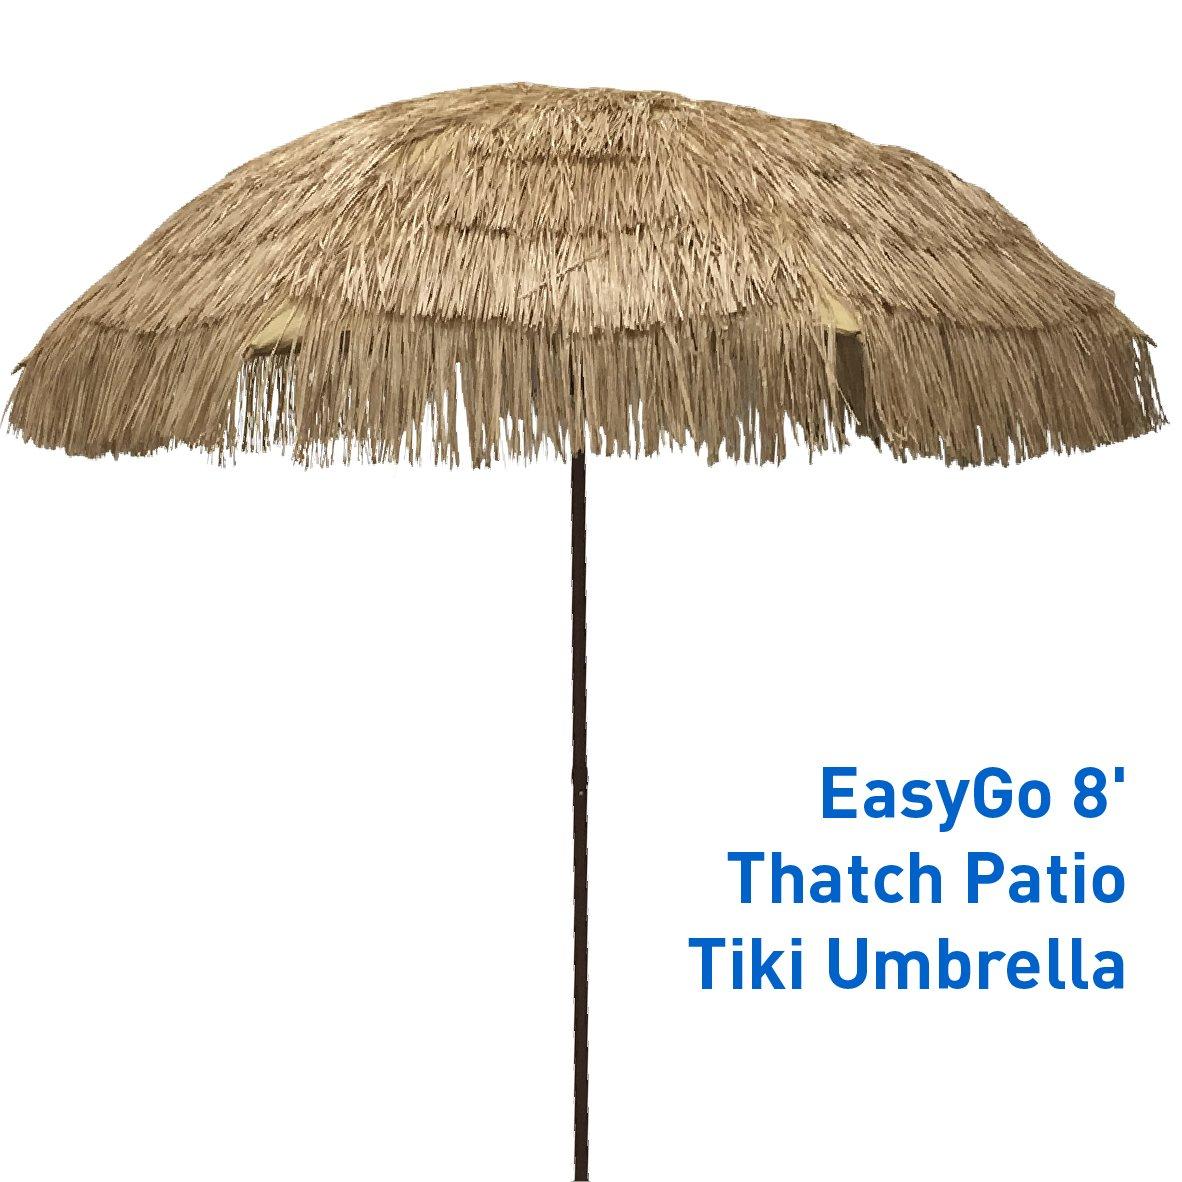 Get Quotations Easygo Thatch Patio Tiki Umbrella Tropical Palapa Raffia Hut Hawaiian Hula Beach